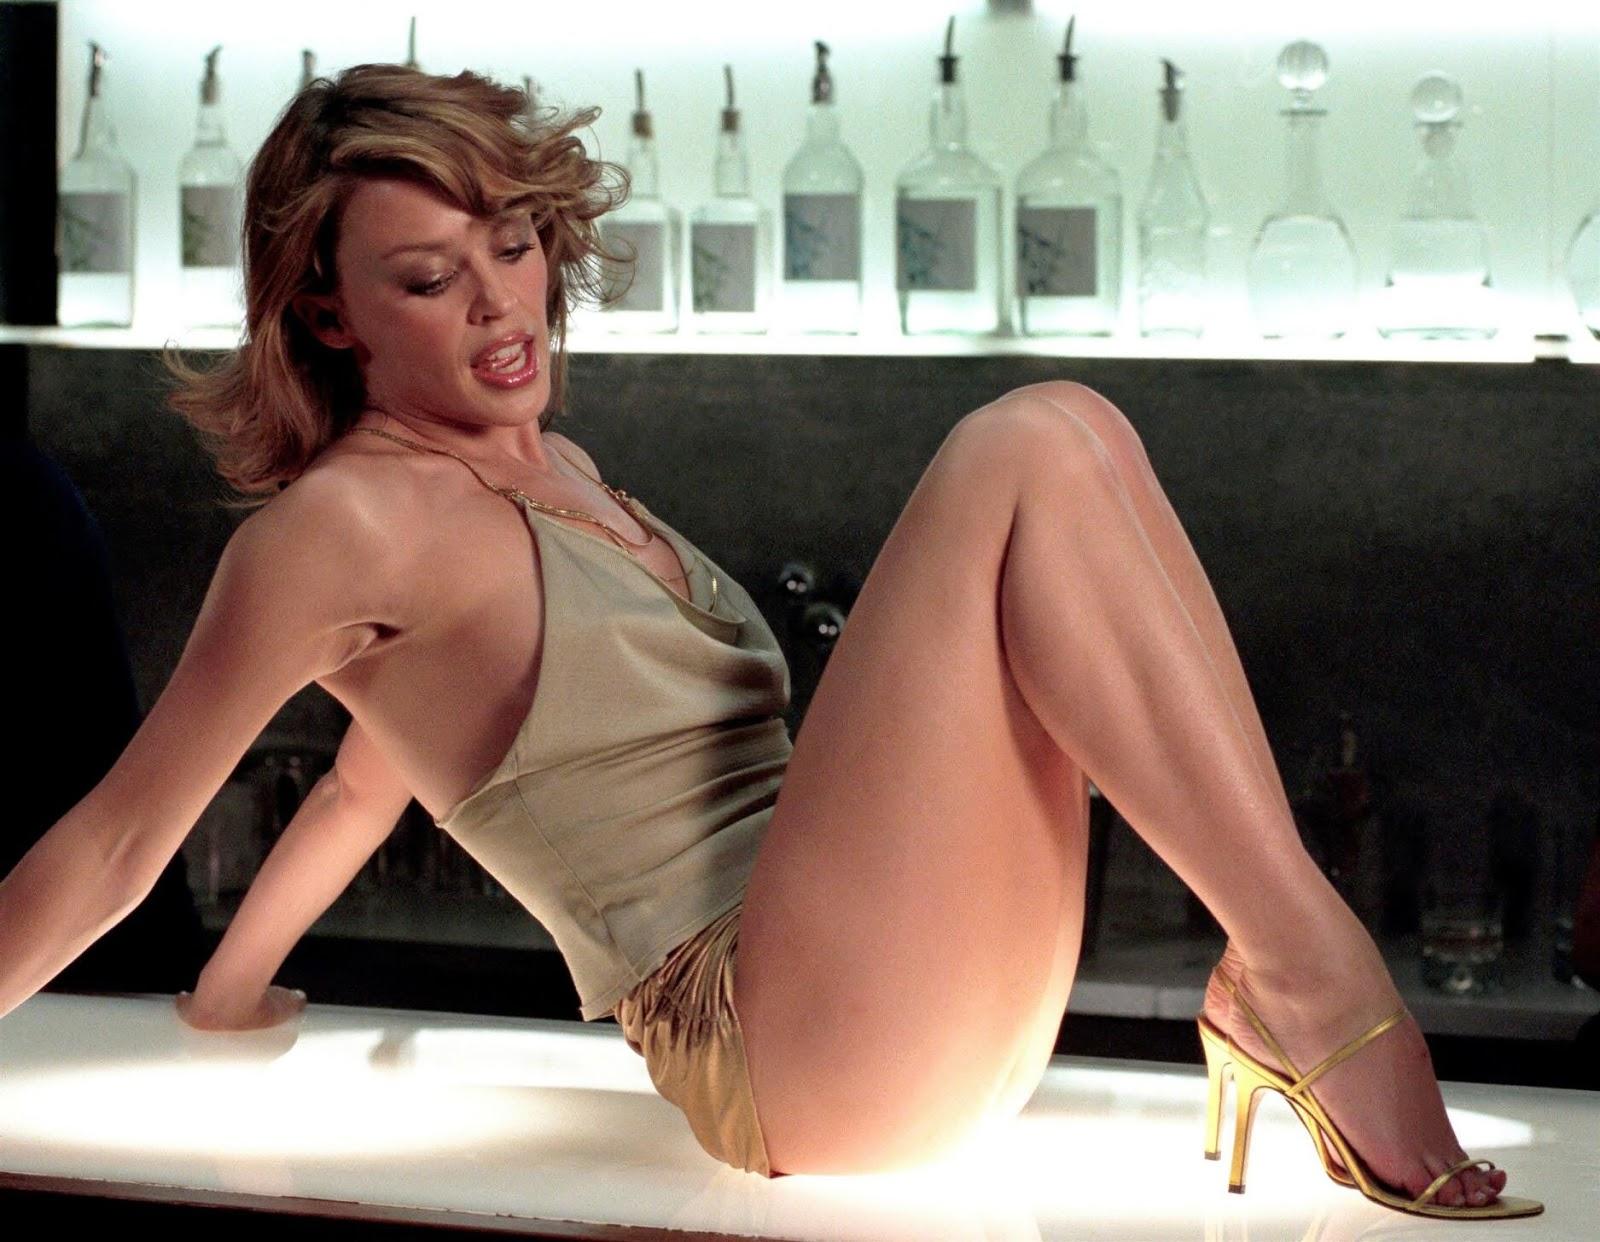 http://2.bp.blogspot.com/-YnzpfdmKRRc/UJ-v0lwTZuI/AAAAAAAAfyY/wyVuf6hNHq0/s1600/67347_Kylie_Minogue_Spinning_Around_04_122_1077lo.jpg